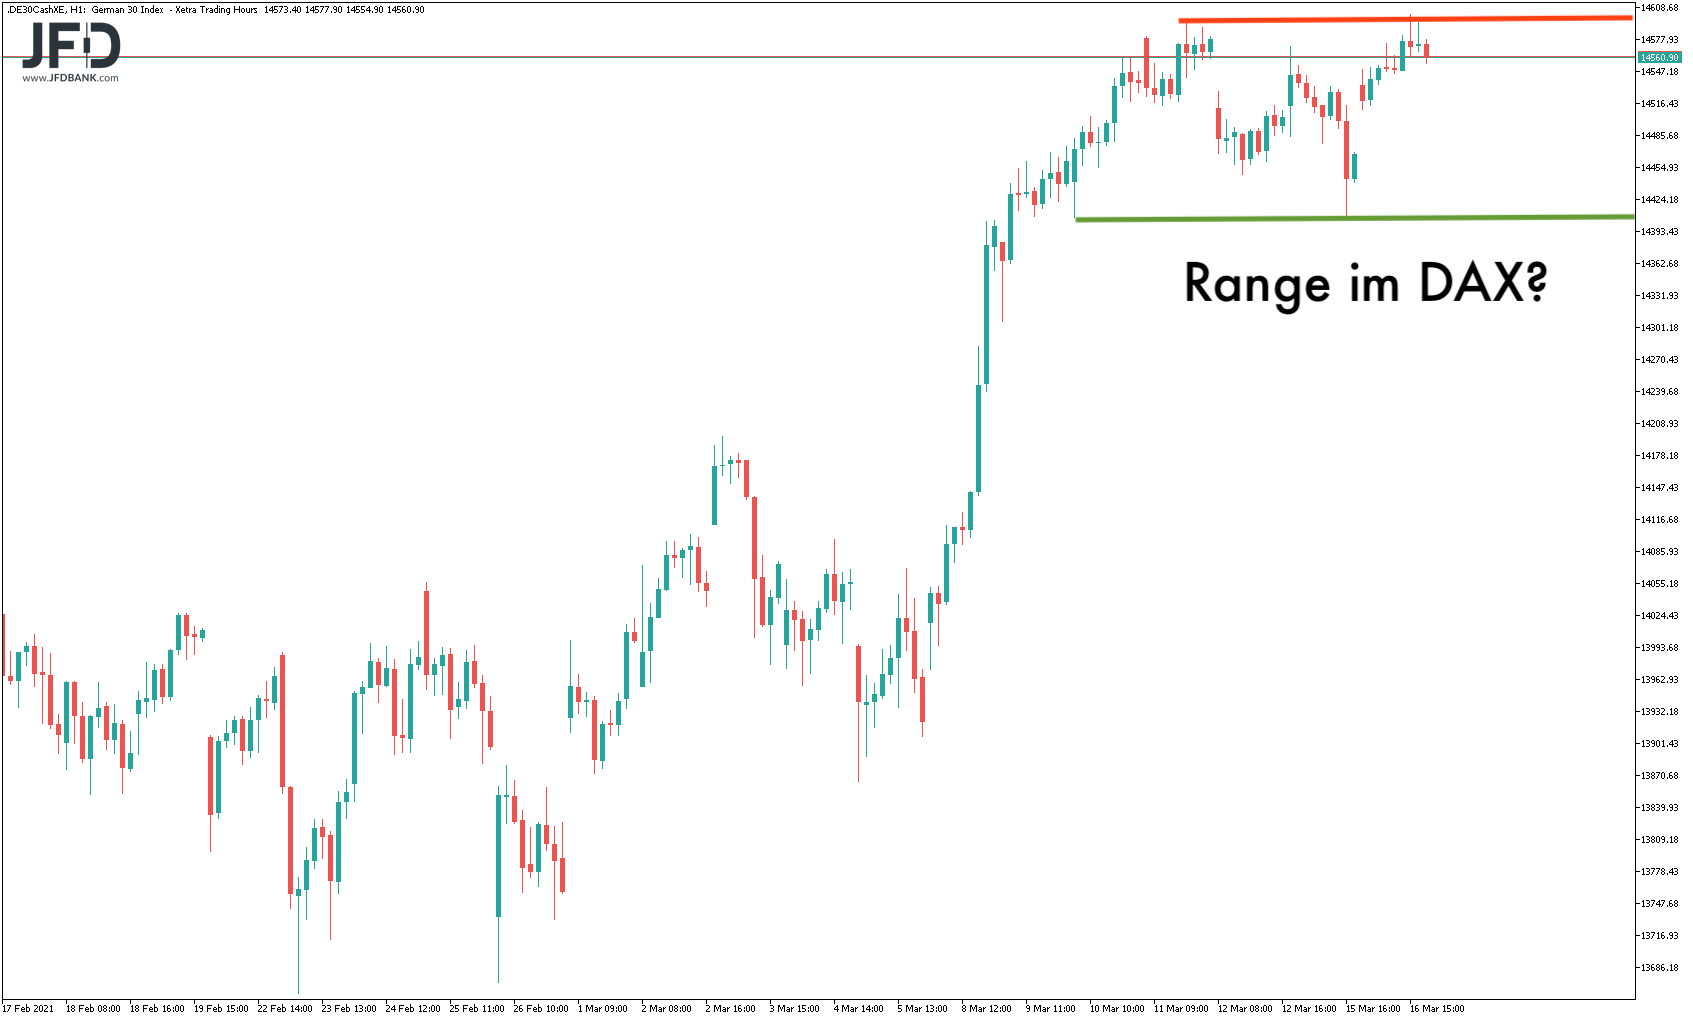 Range-Szenario im DAX